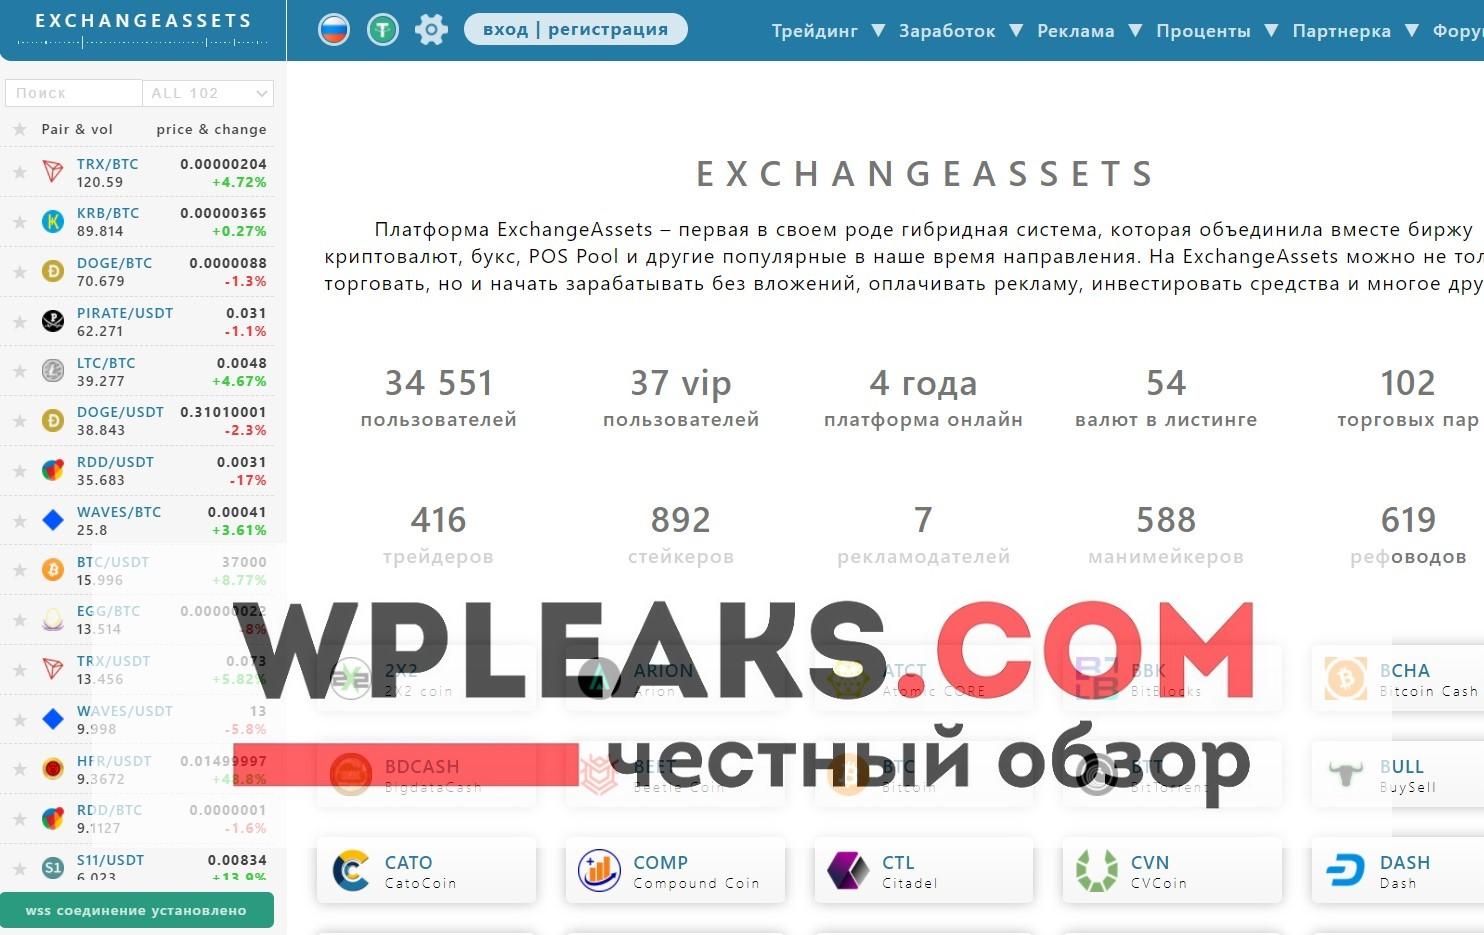 Биржа Exchange Assets